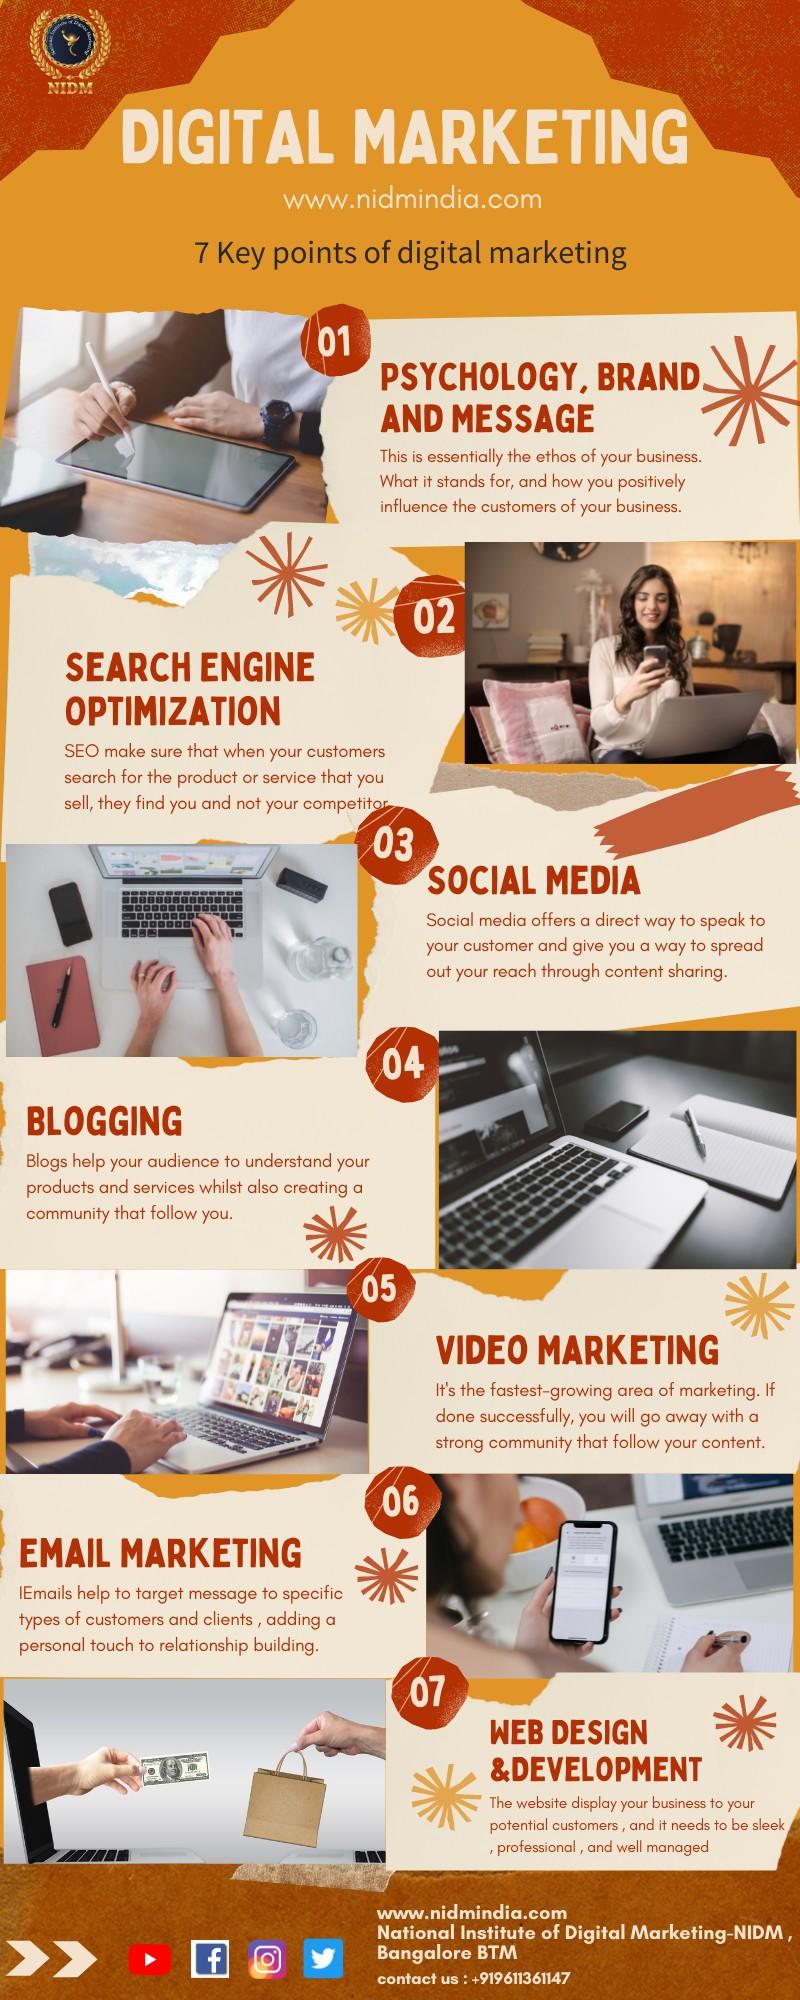 nidm digital marketing